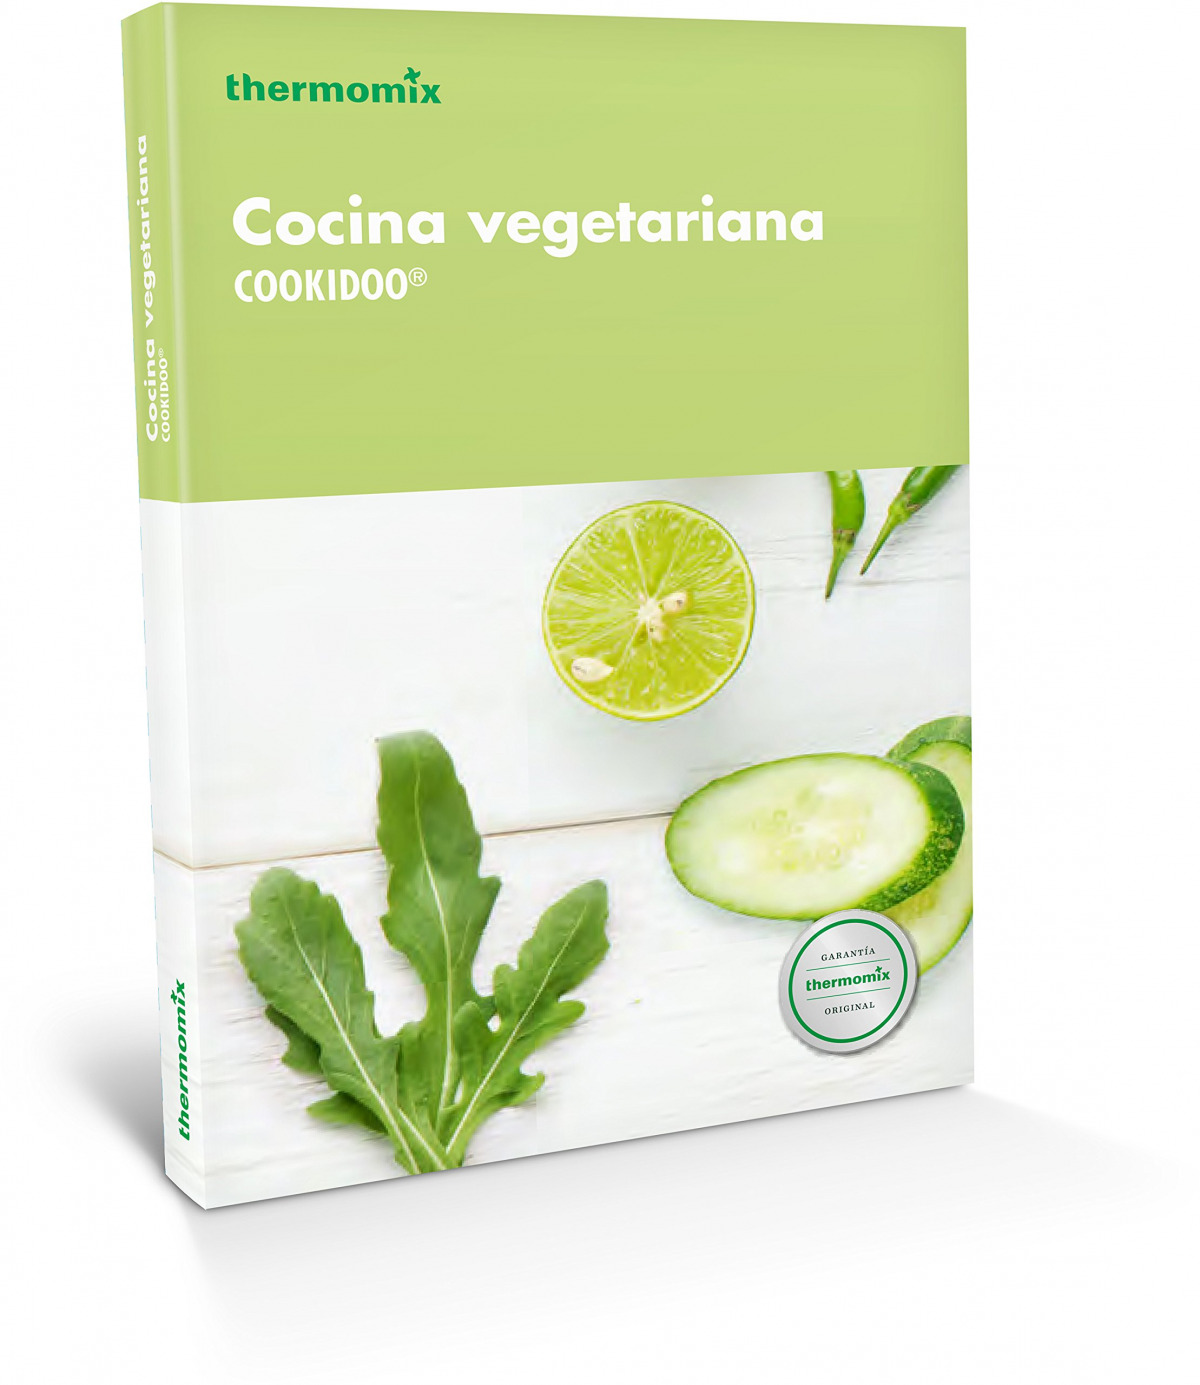 COCINA VEGETARIANA 9788416902125